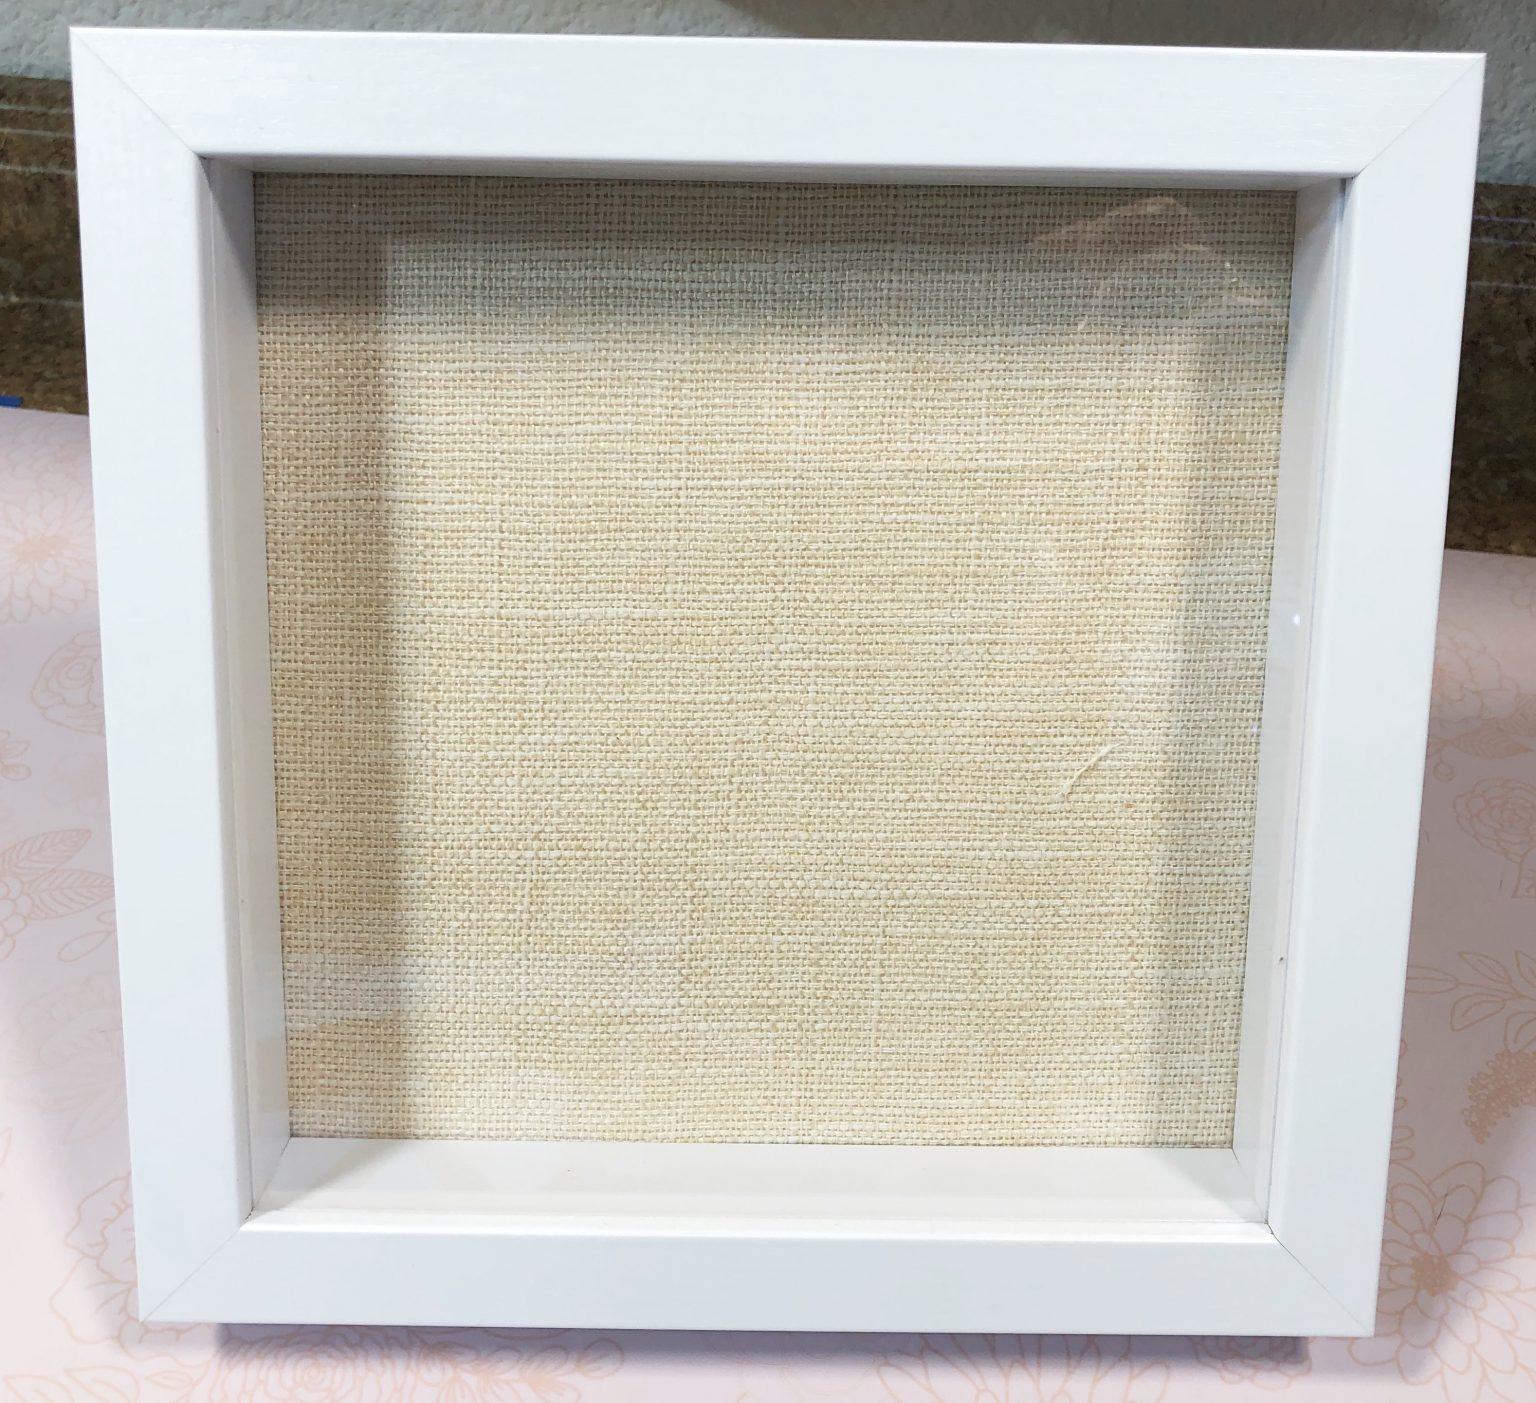 White Shadow Box frame